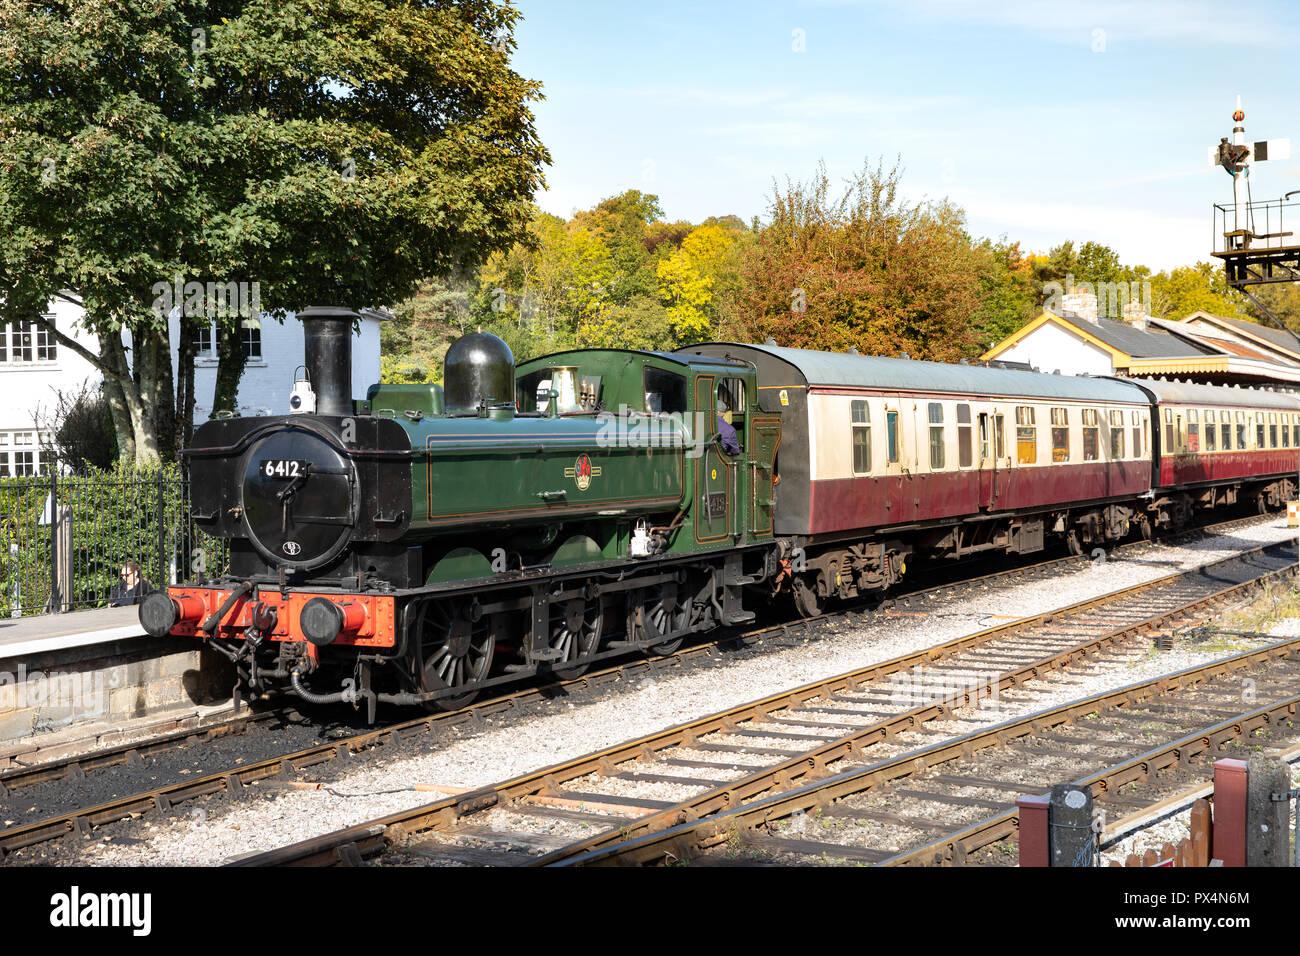 South Devon Railway Line (Heritage Railway). - Stock Image